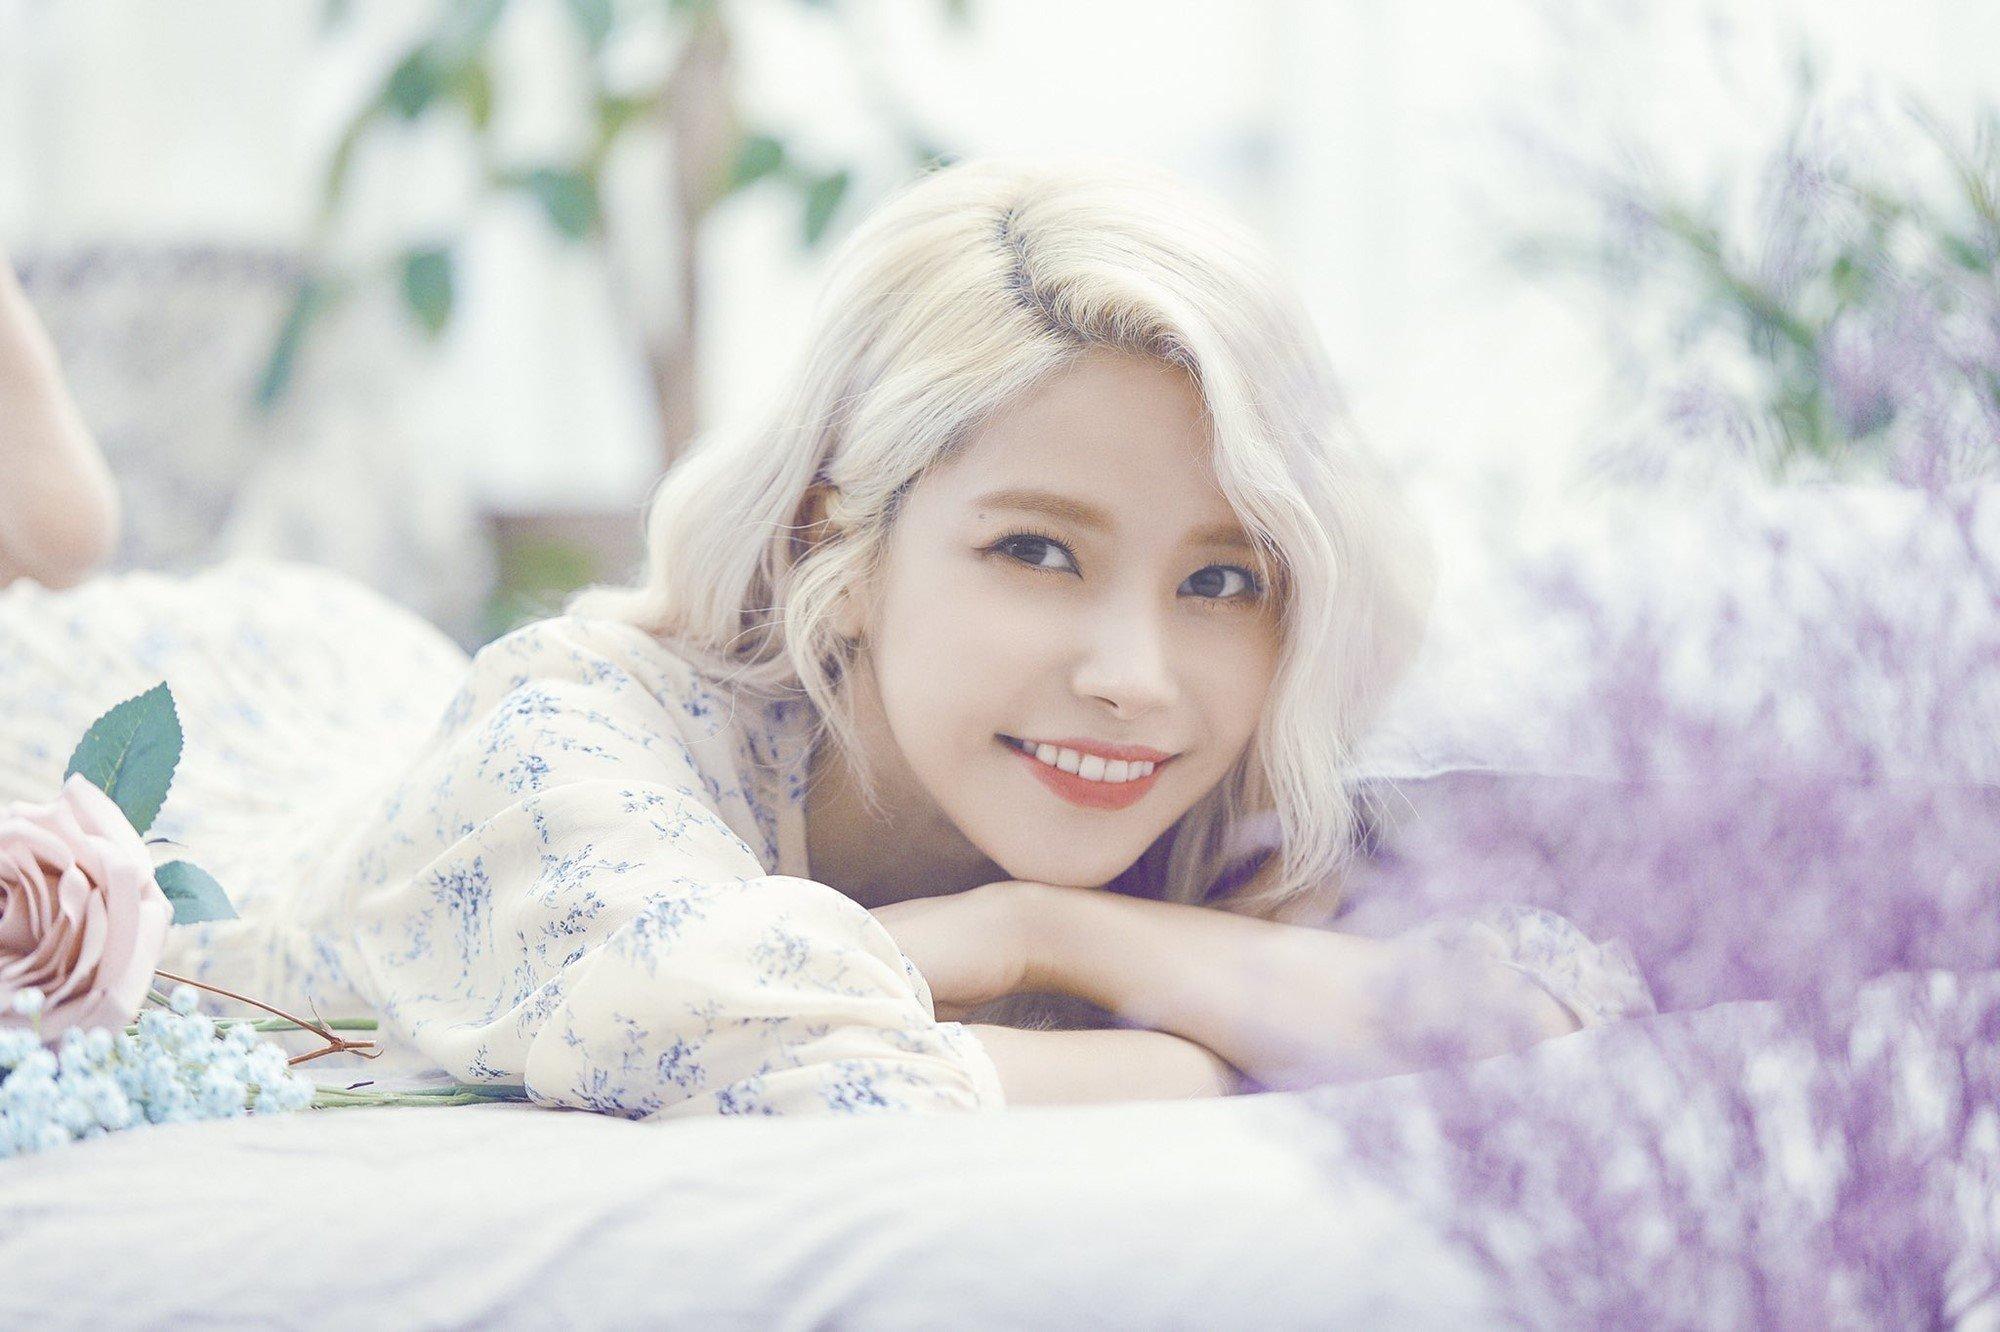 120 Chan Porn japanese porn star k-pop girl group honey popcorn to hold